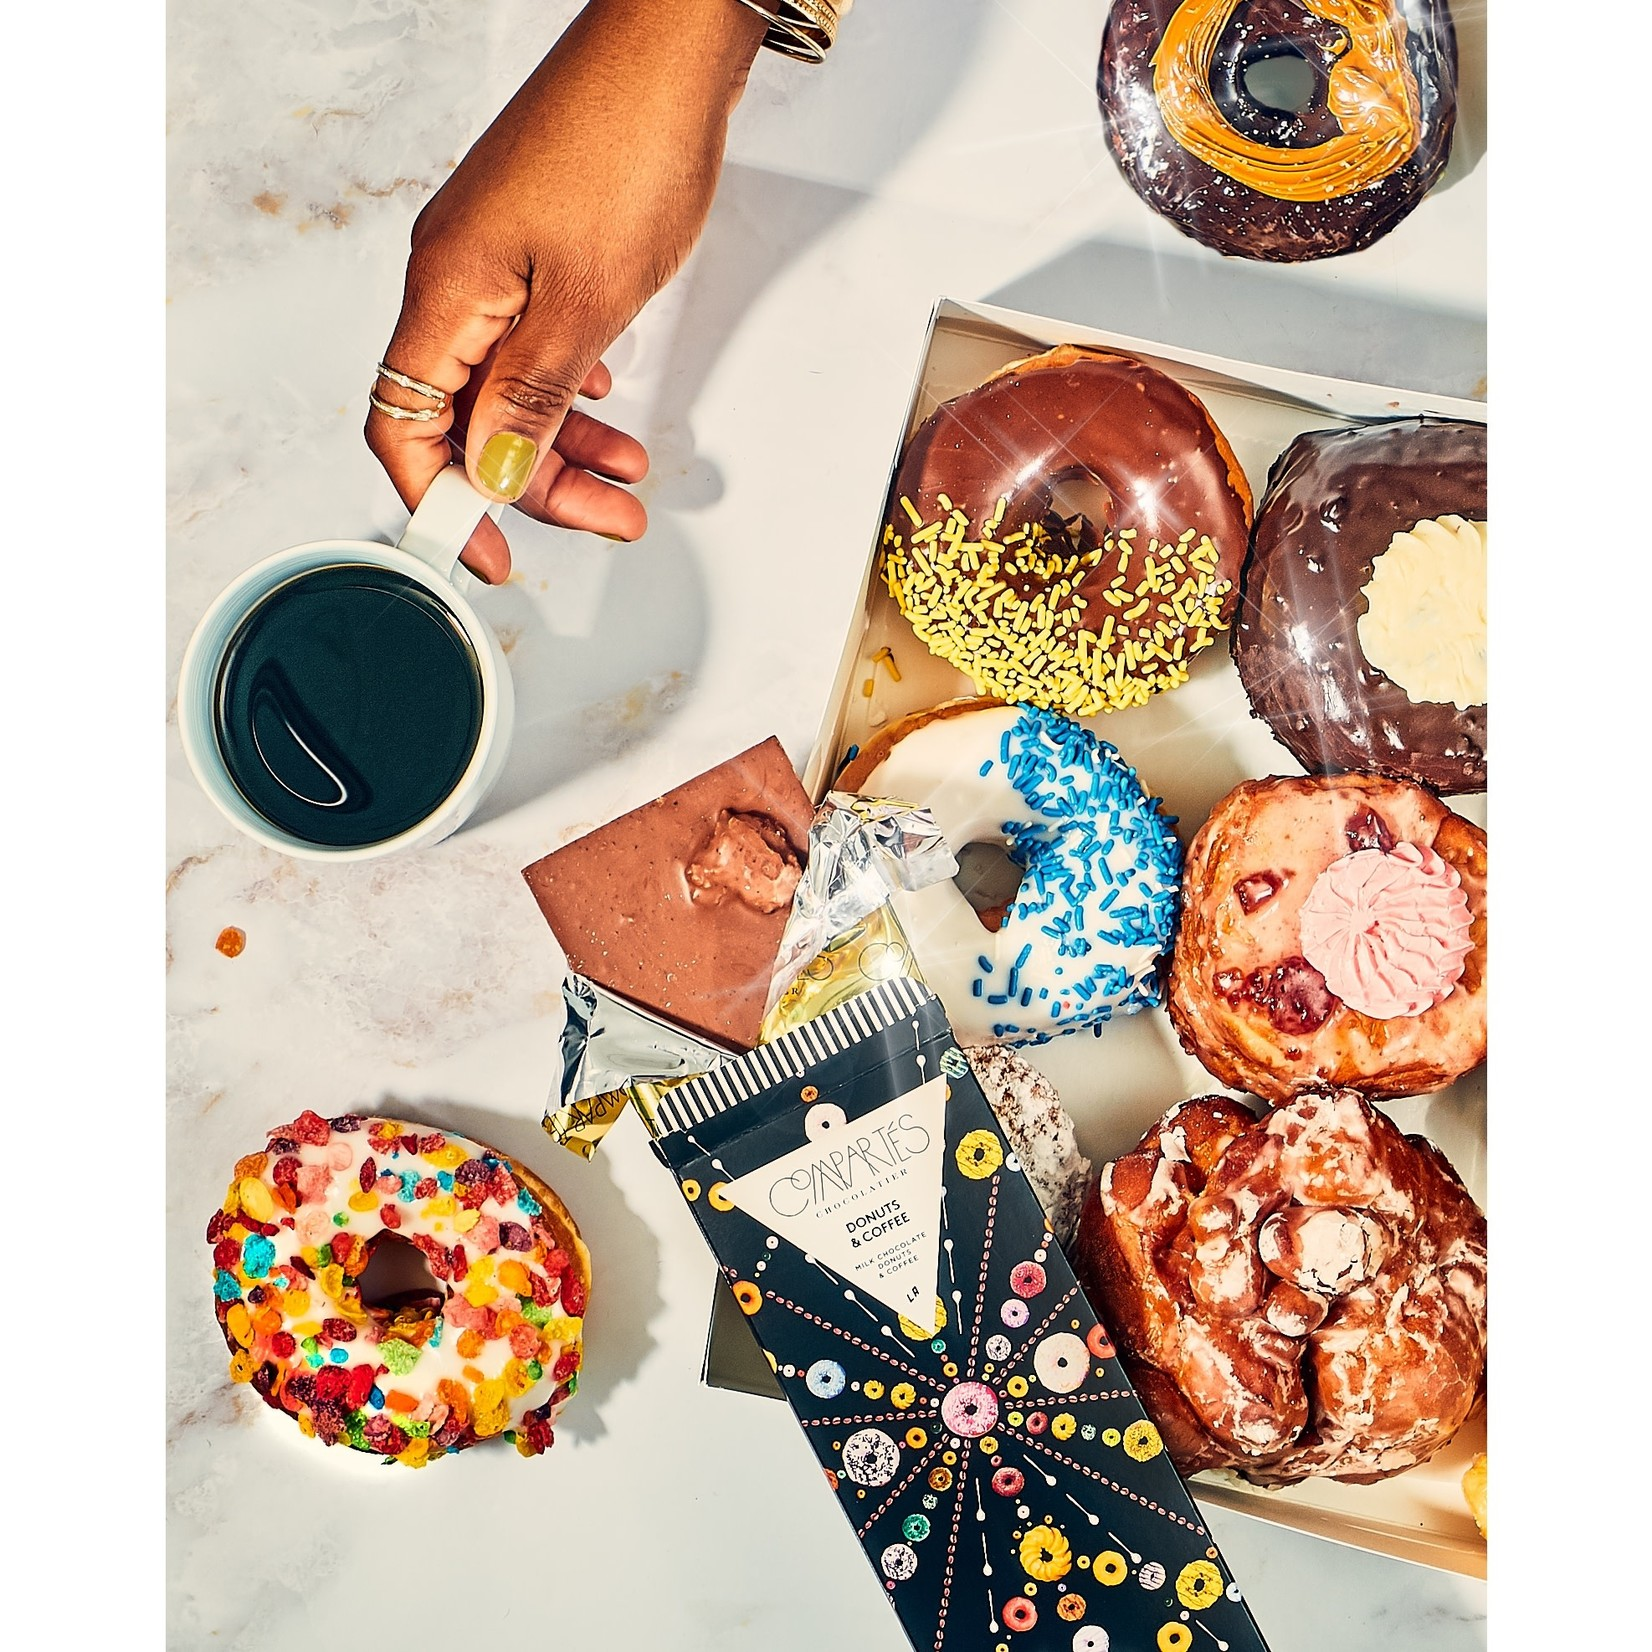 Compartes Chocolate Compartes Donuts & Coffee Milk Chocolate Bar